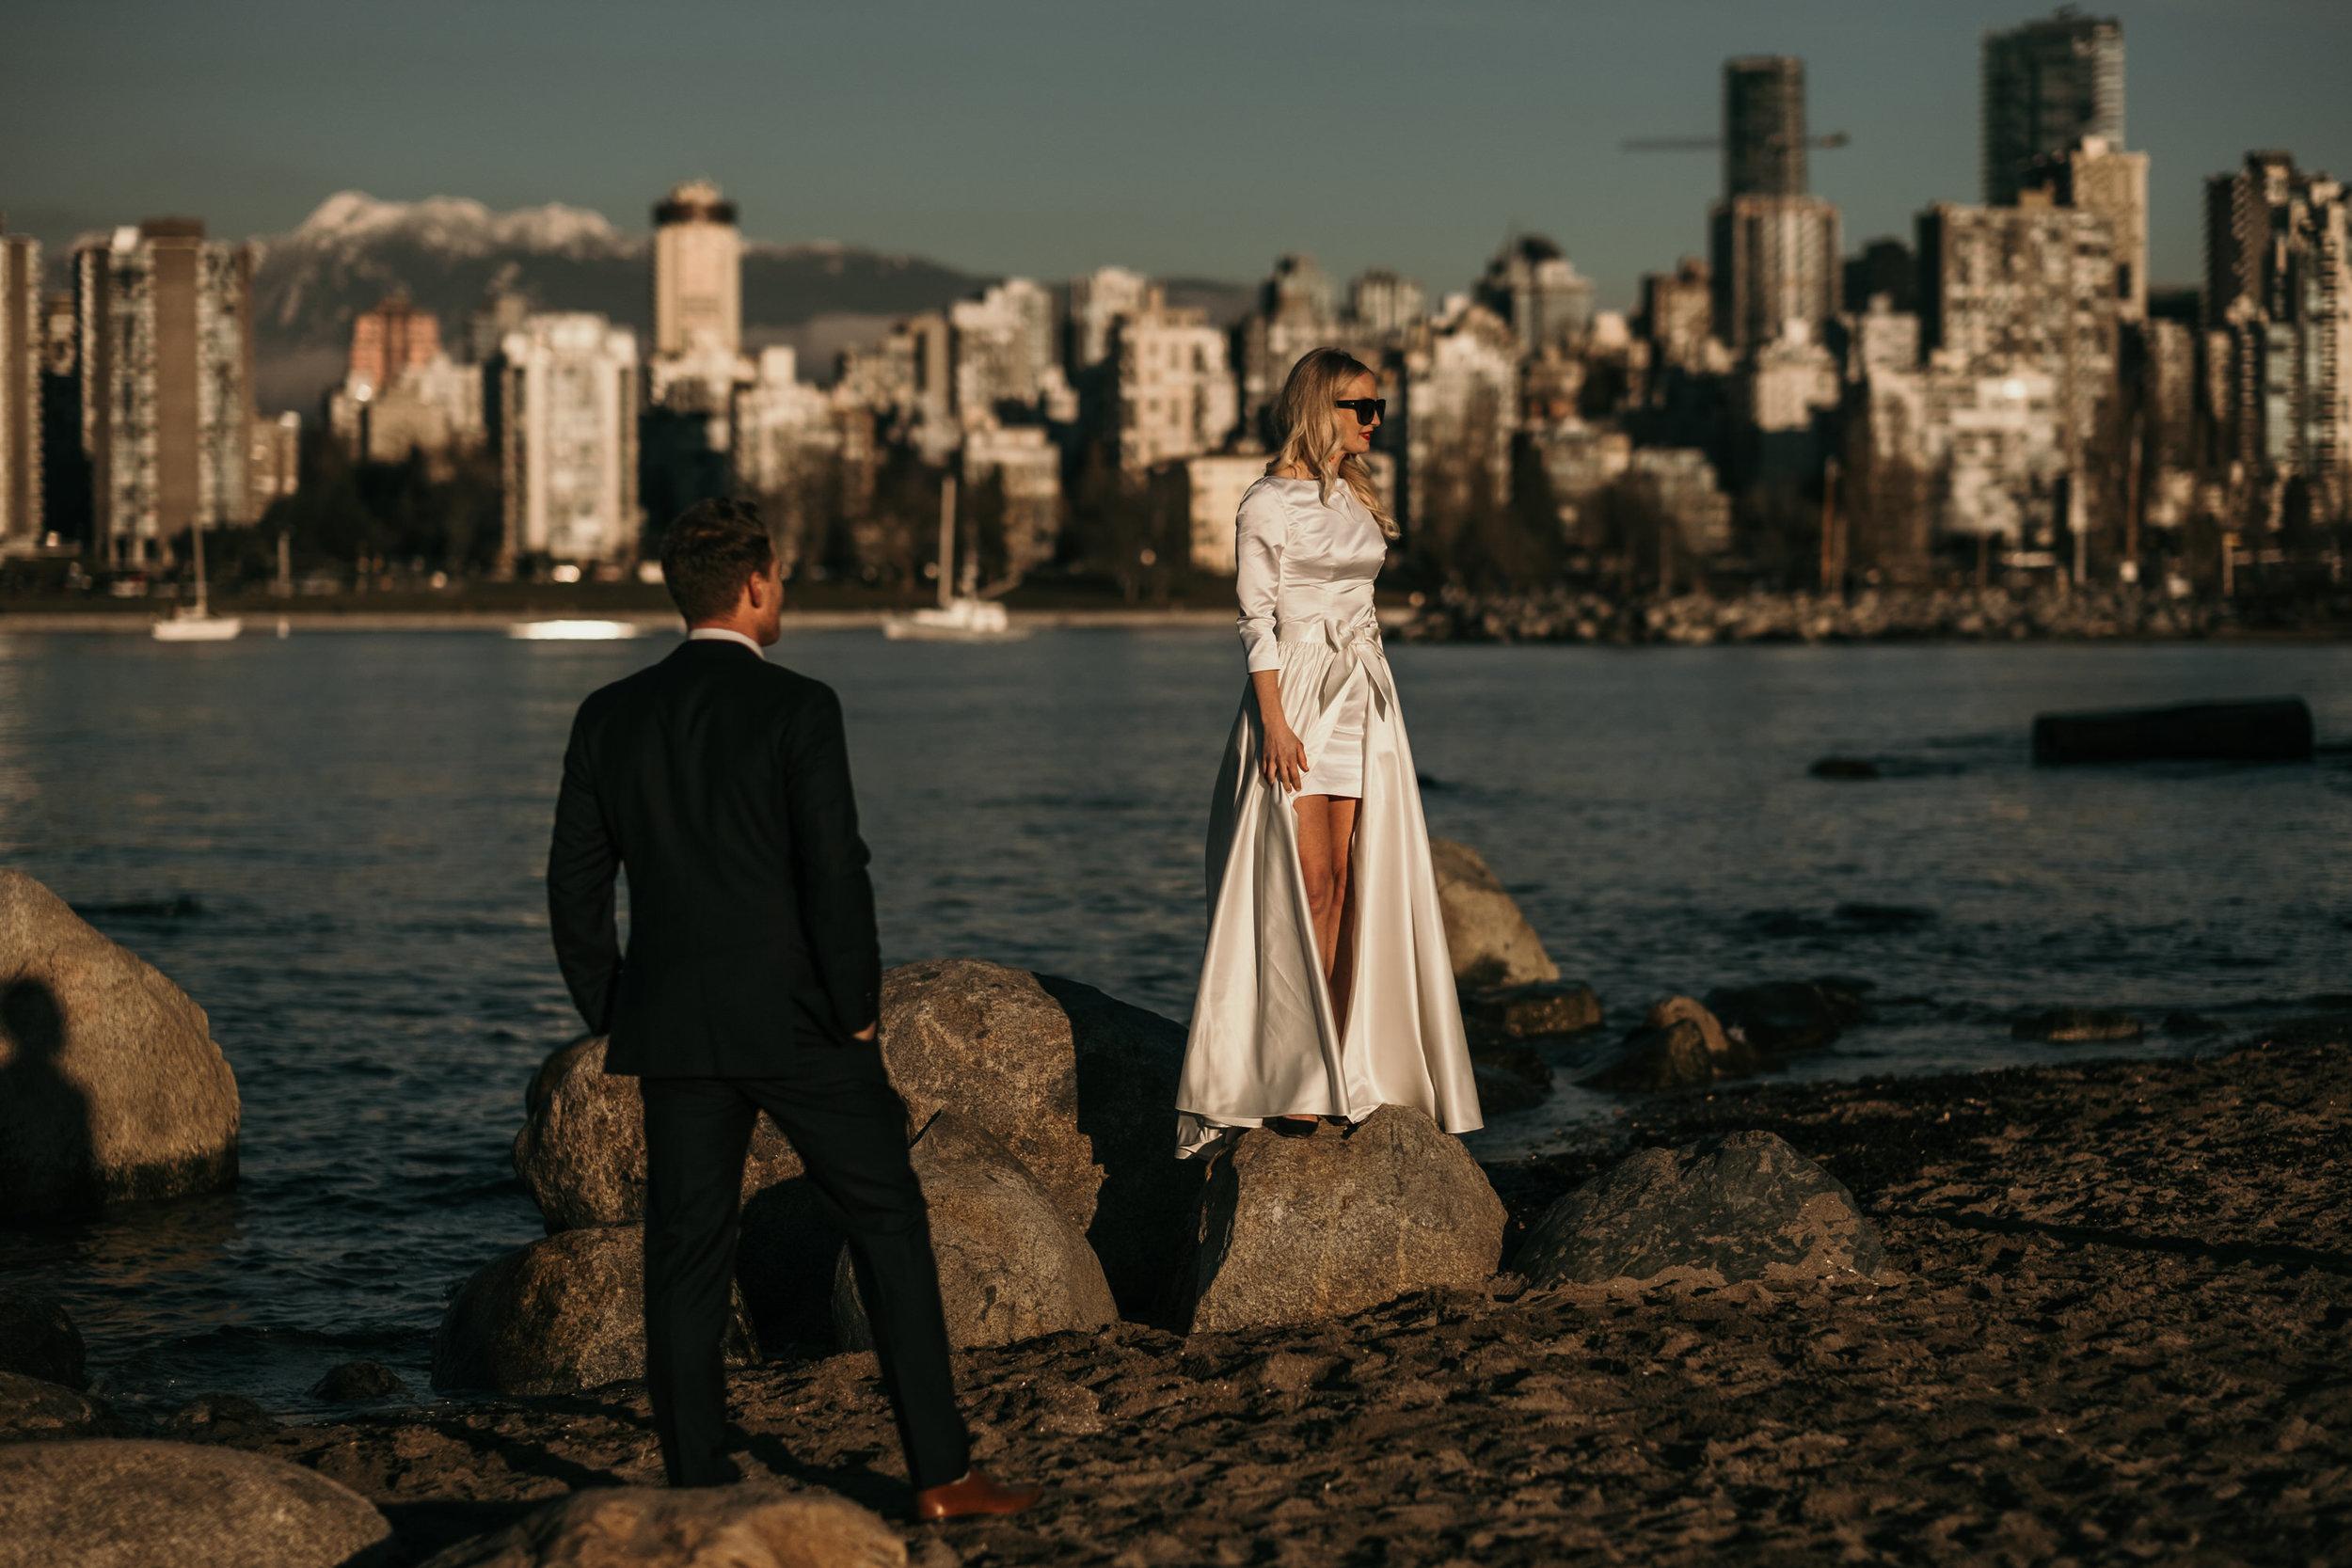 Vancouver Wedding Photos - Vegan Wedding Photographer - New Years Eve Wedding Photos - Vancouver Wedding Photographer - Vancouver Wedding Videographer - 738.JPG